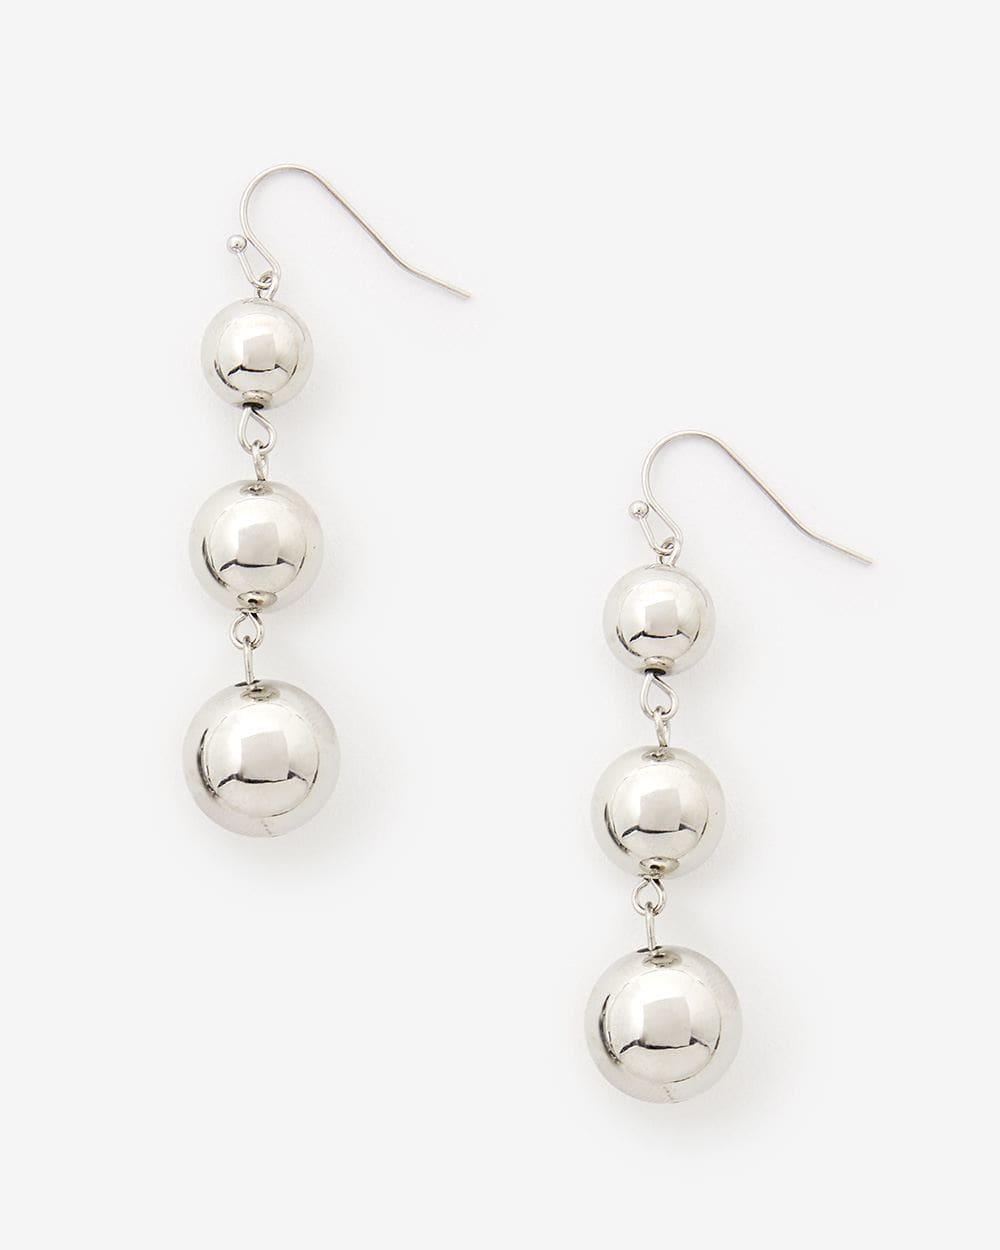 3-Ball Pendant Earrings